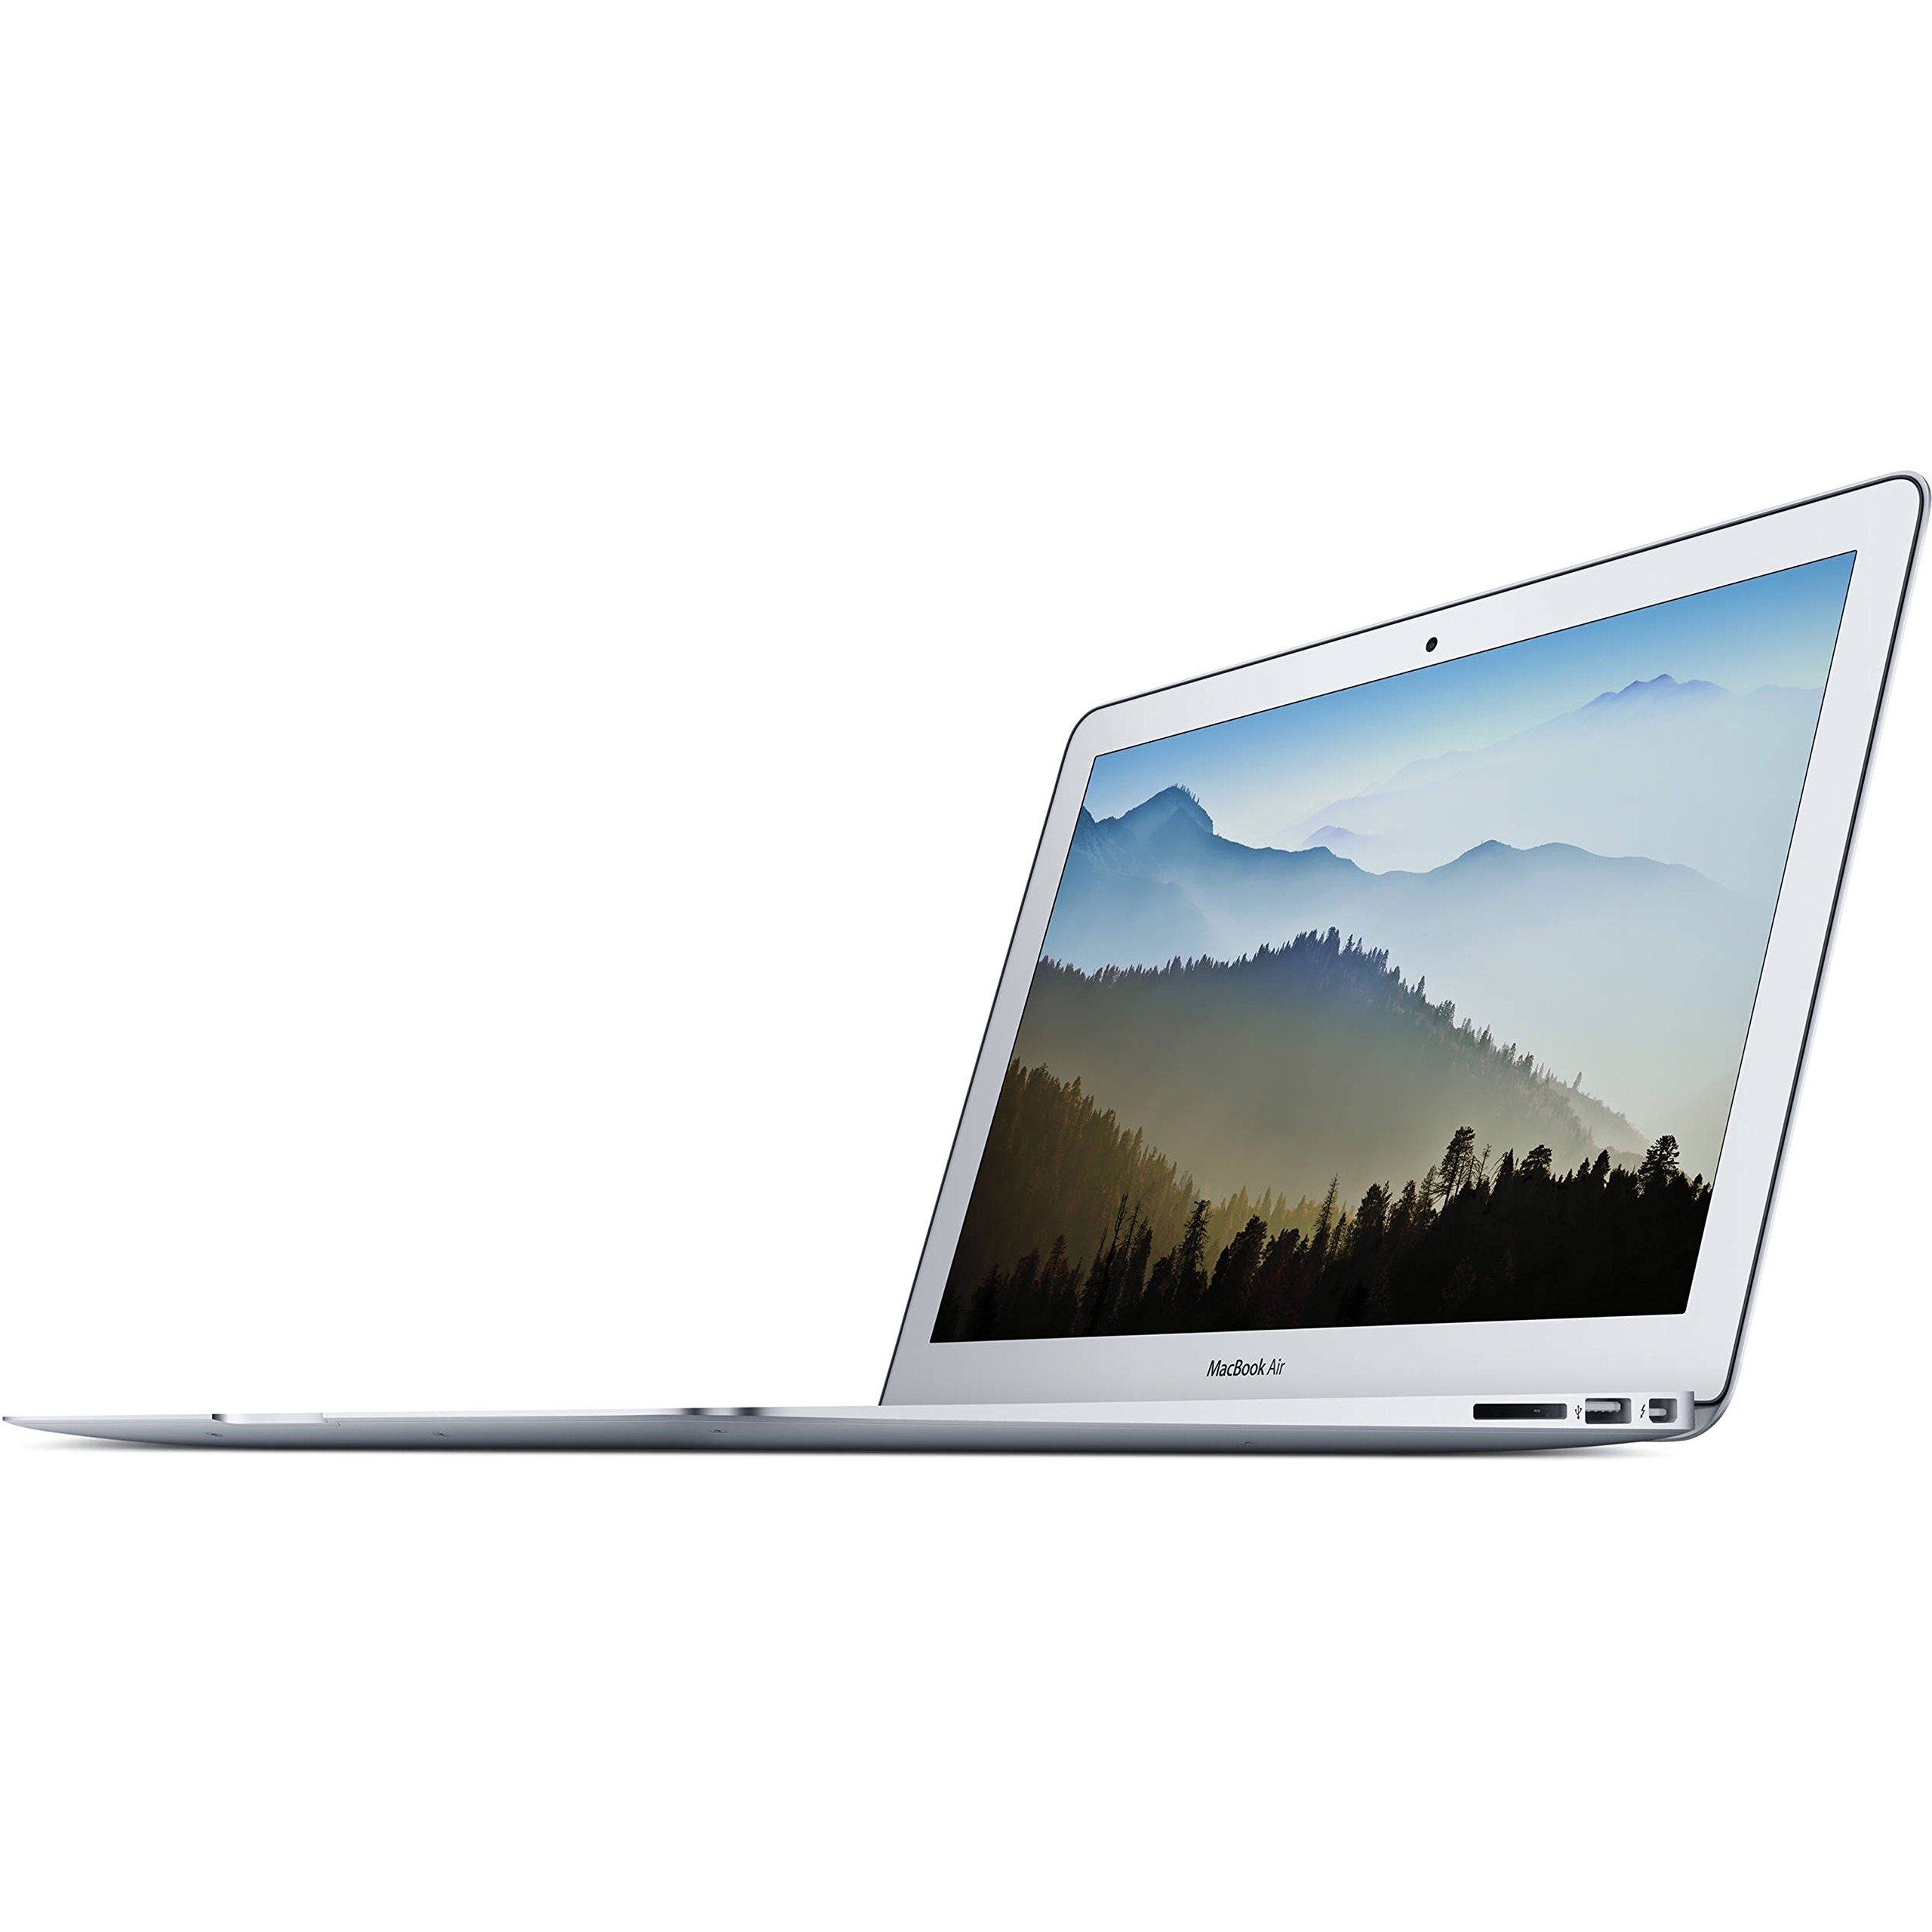 Apple 13'' MacBook Air, 1.8GHz Intel Core i5 Dual Core Processor, 8GB RAM, 128GB SSD, Mac OS, Silver, MQD32LL/A (Newest Version) (Certified Refurbished)